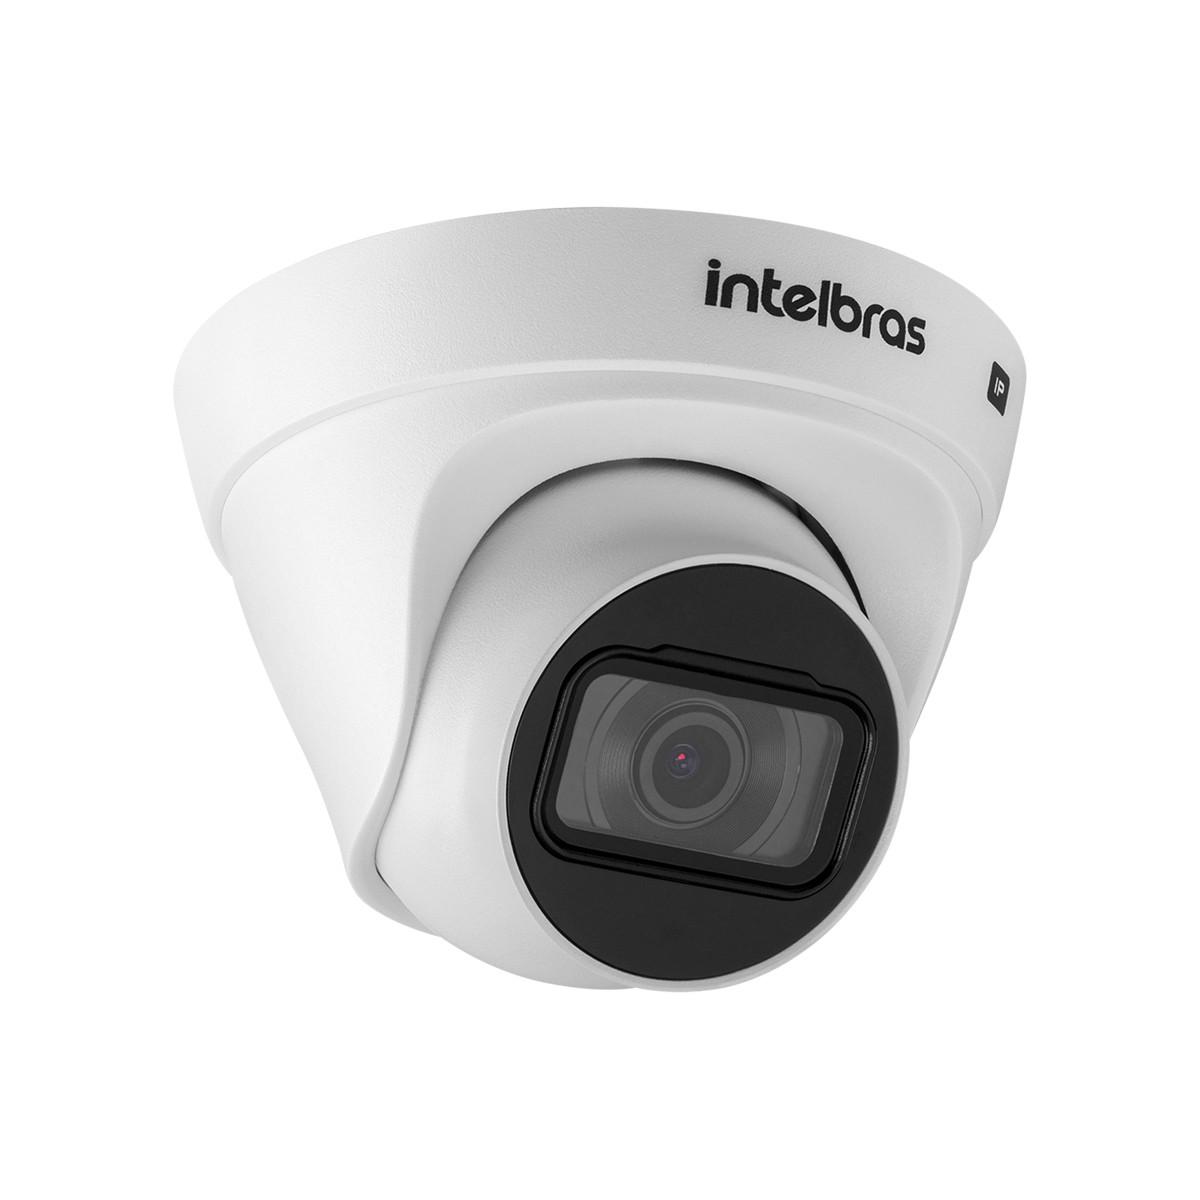 Câmera IP 2 Megapixels 2.8mm 20m VIP 3220 D Intelbras